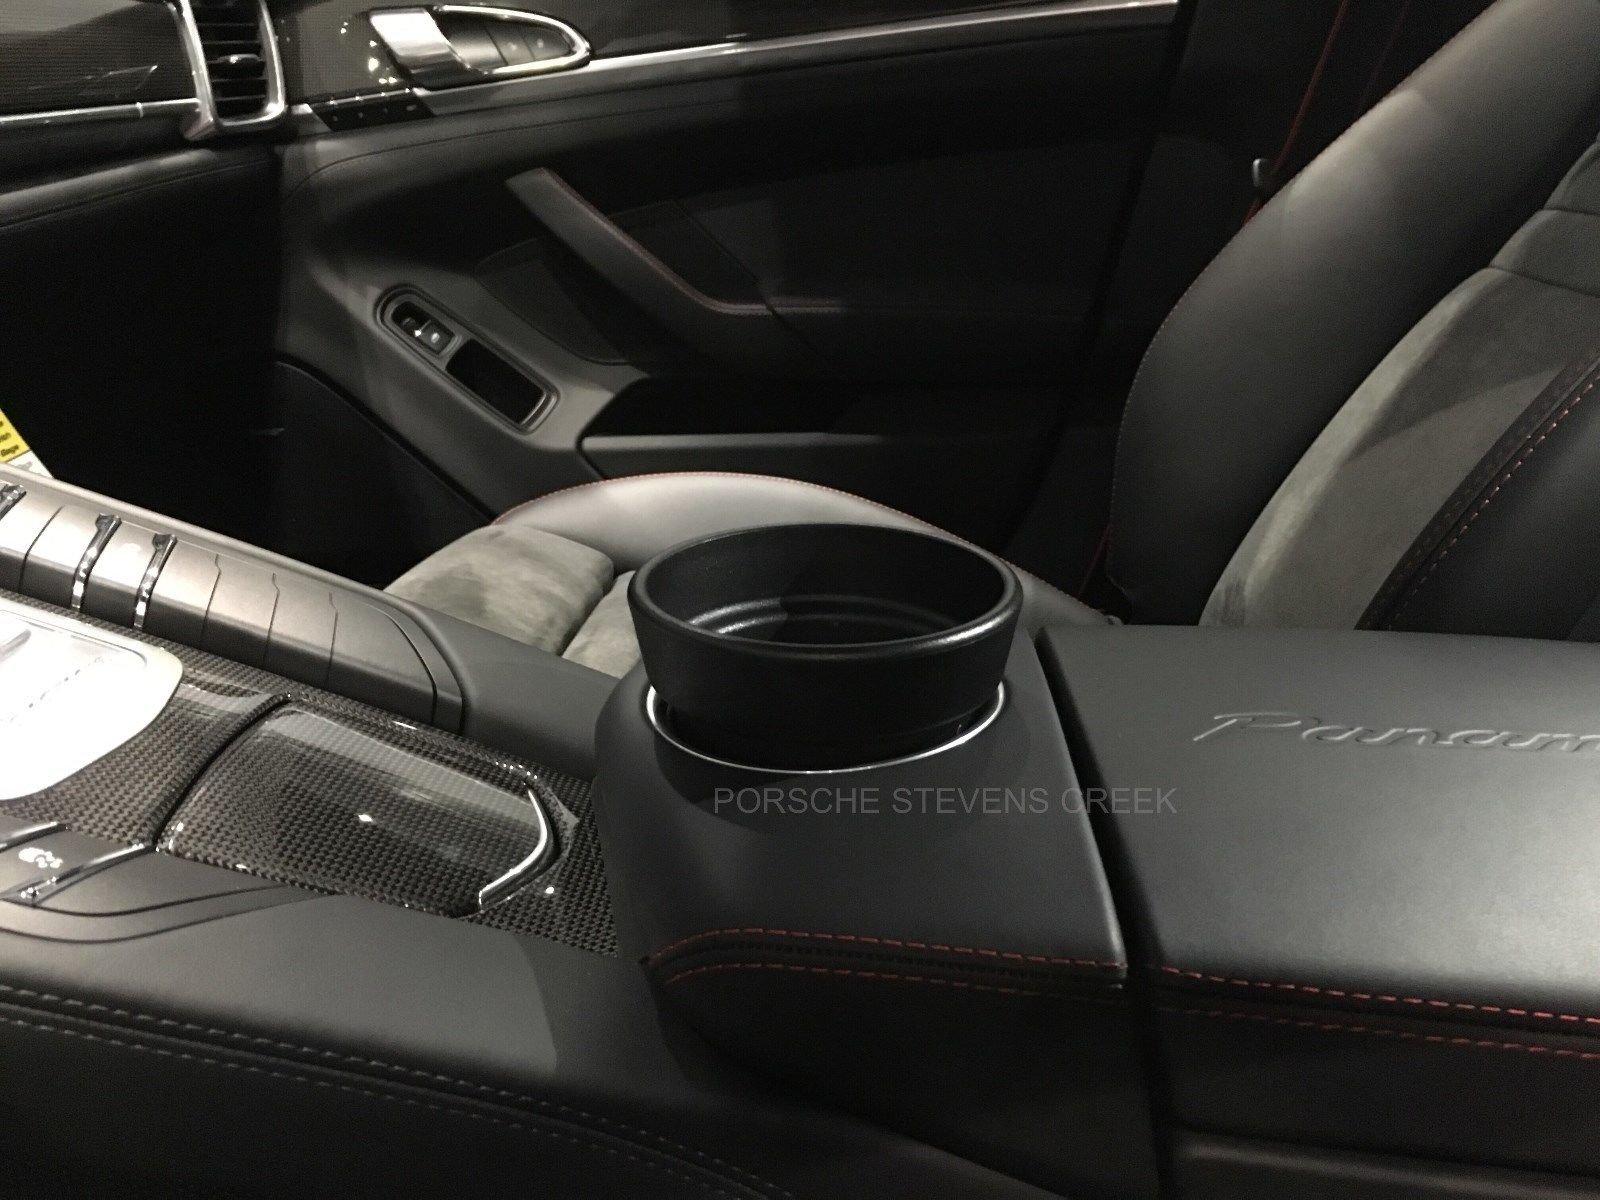 2010-2017 Kuda 089080 Leather Mount Black Compatible with Porsche Panamera